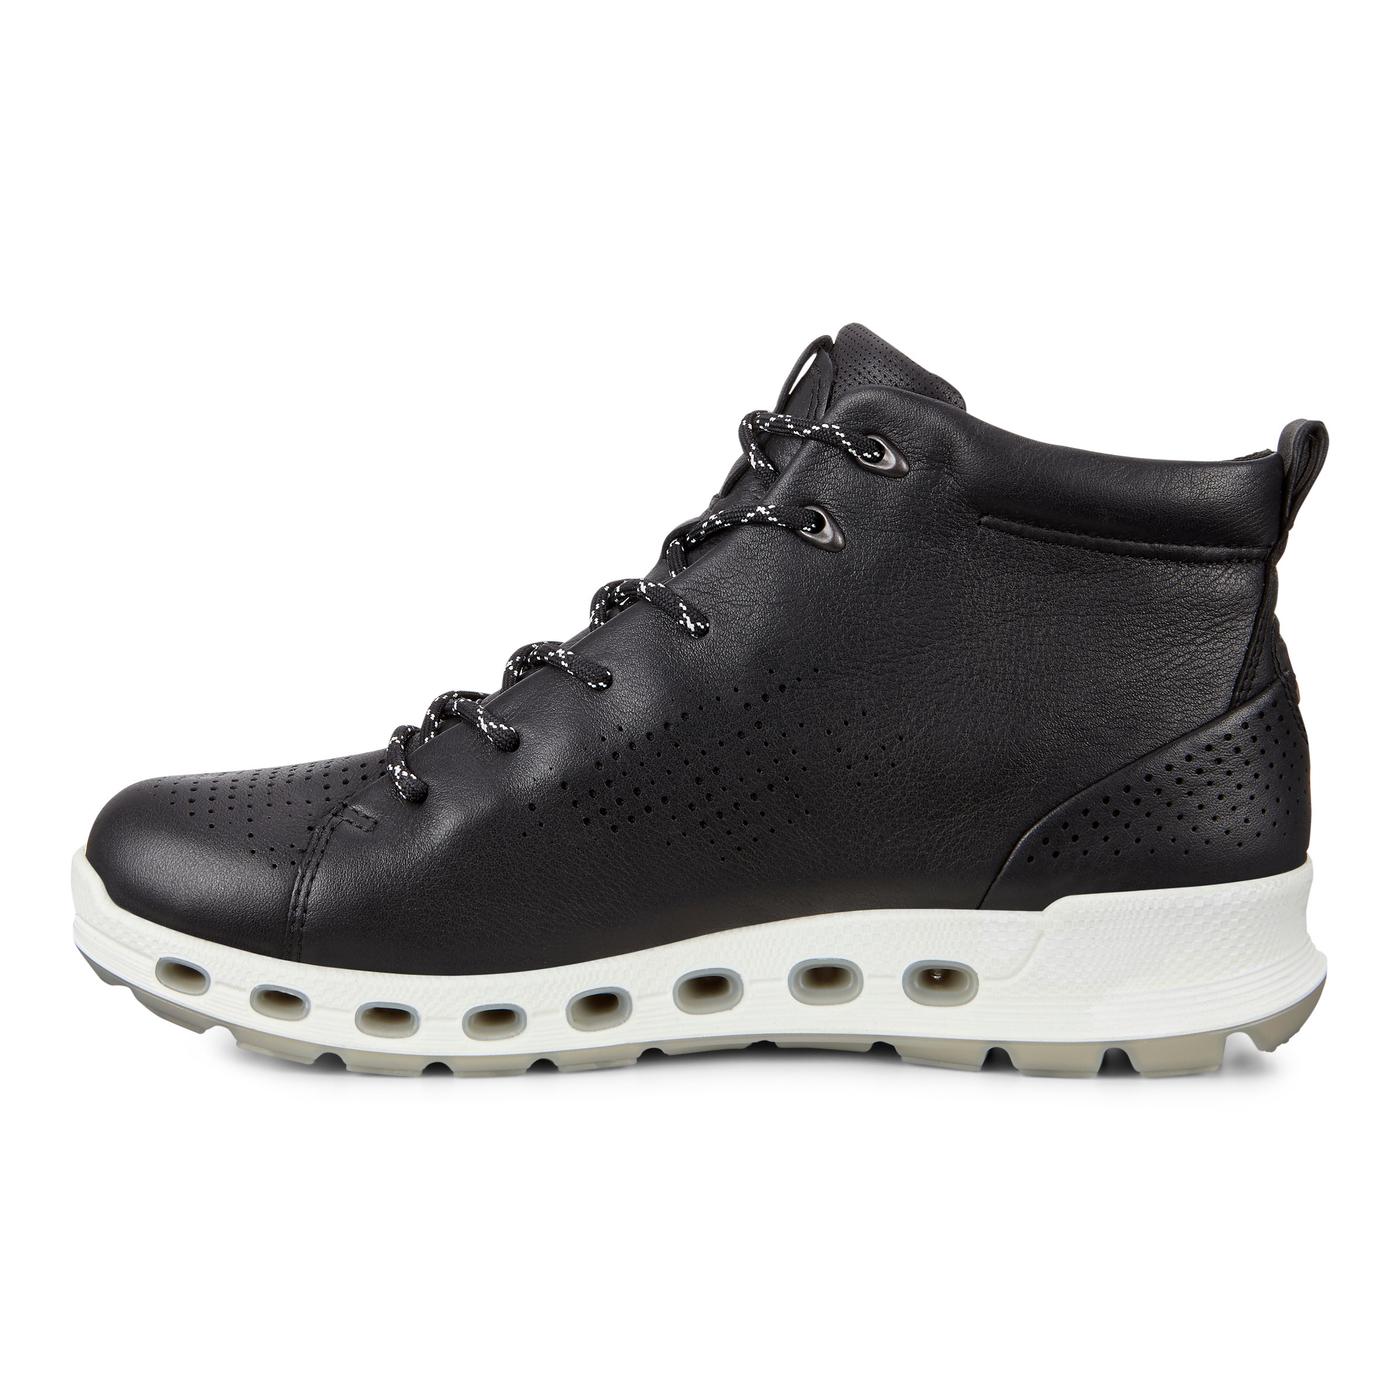 ECCO COOL 2.0 LADIES Sneaker A